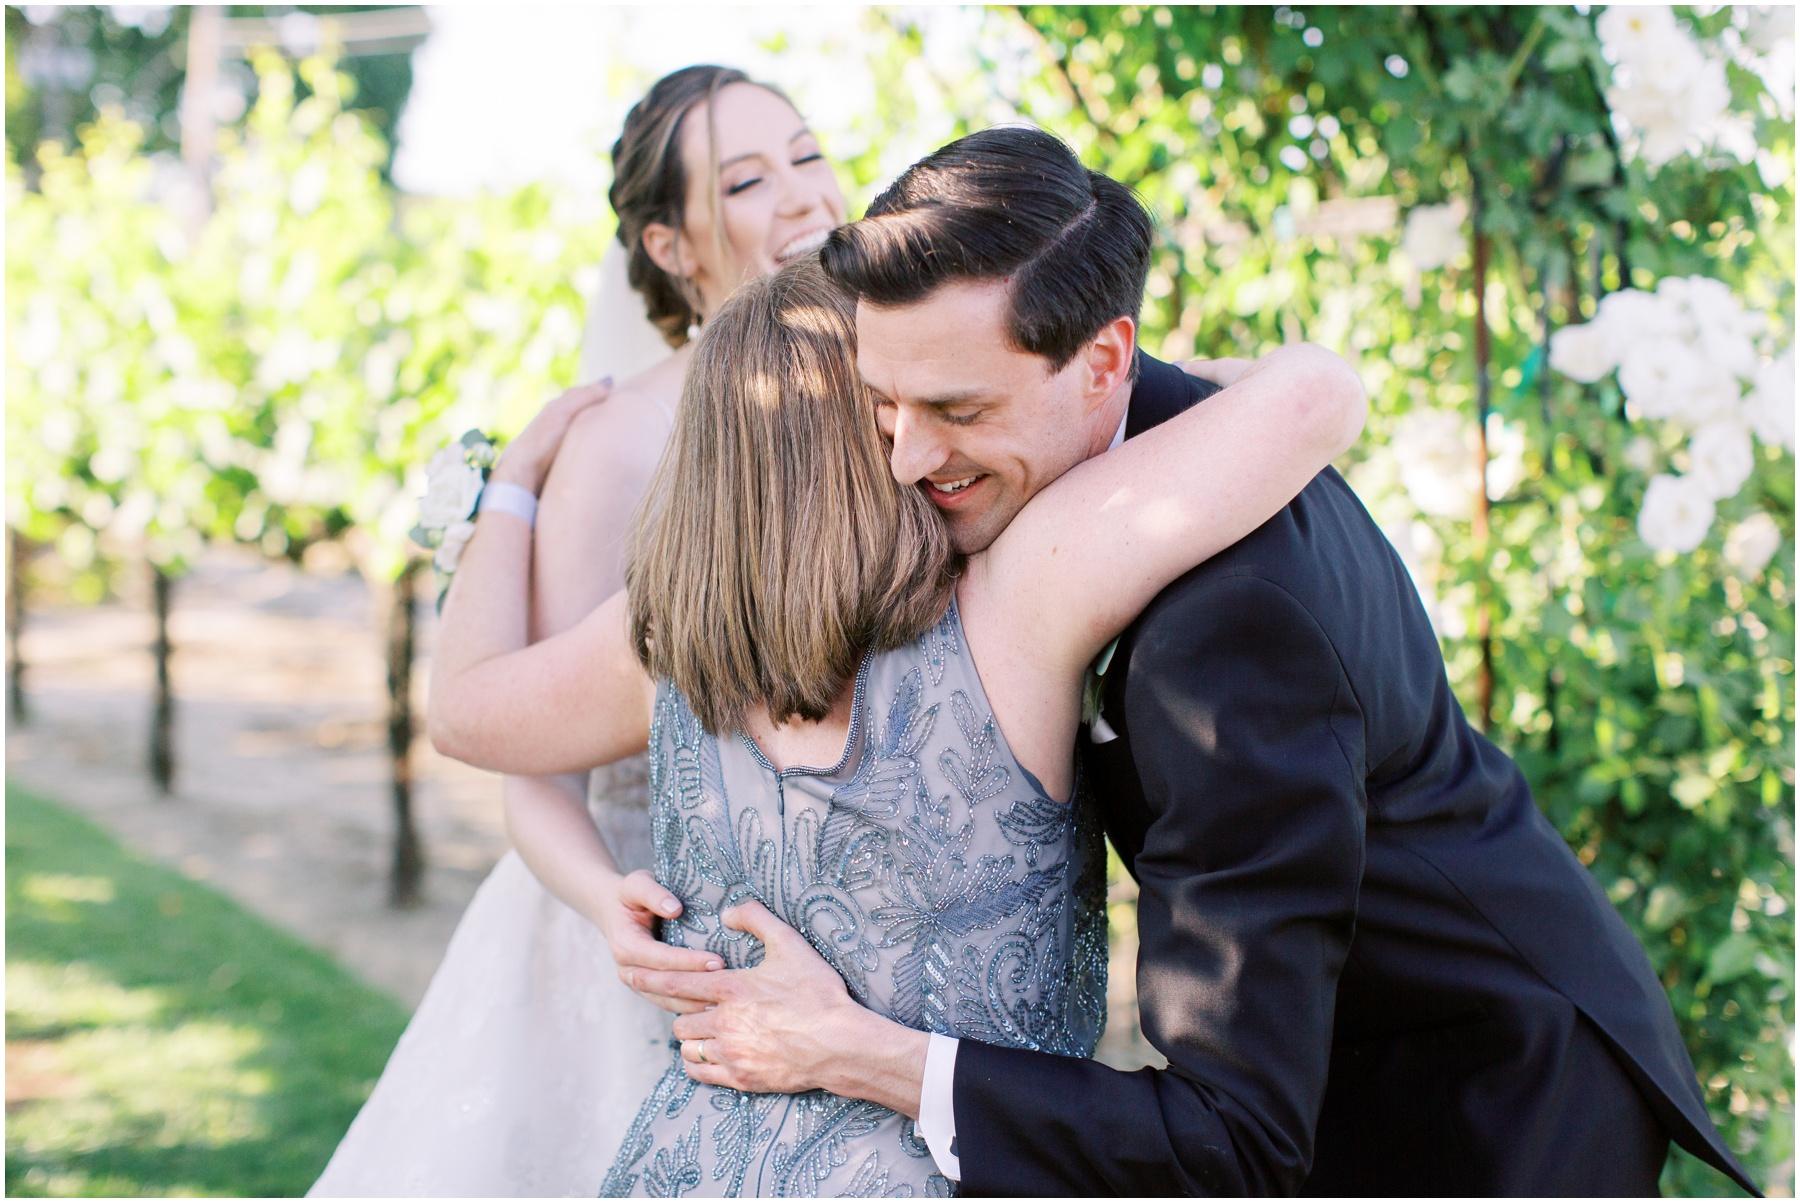 Scribner-bend-vineyards-wedding-sacramento-california-Kristine-Herman-Photography-158.jpg